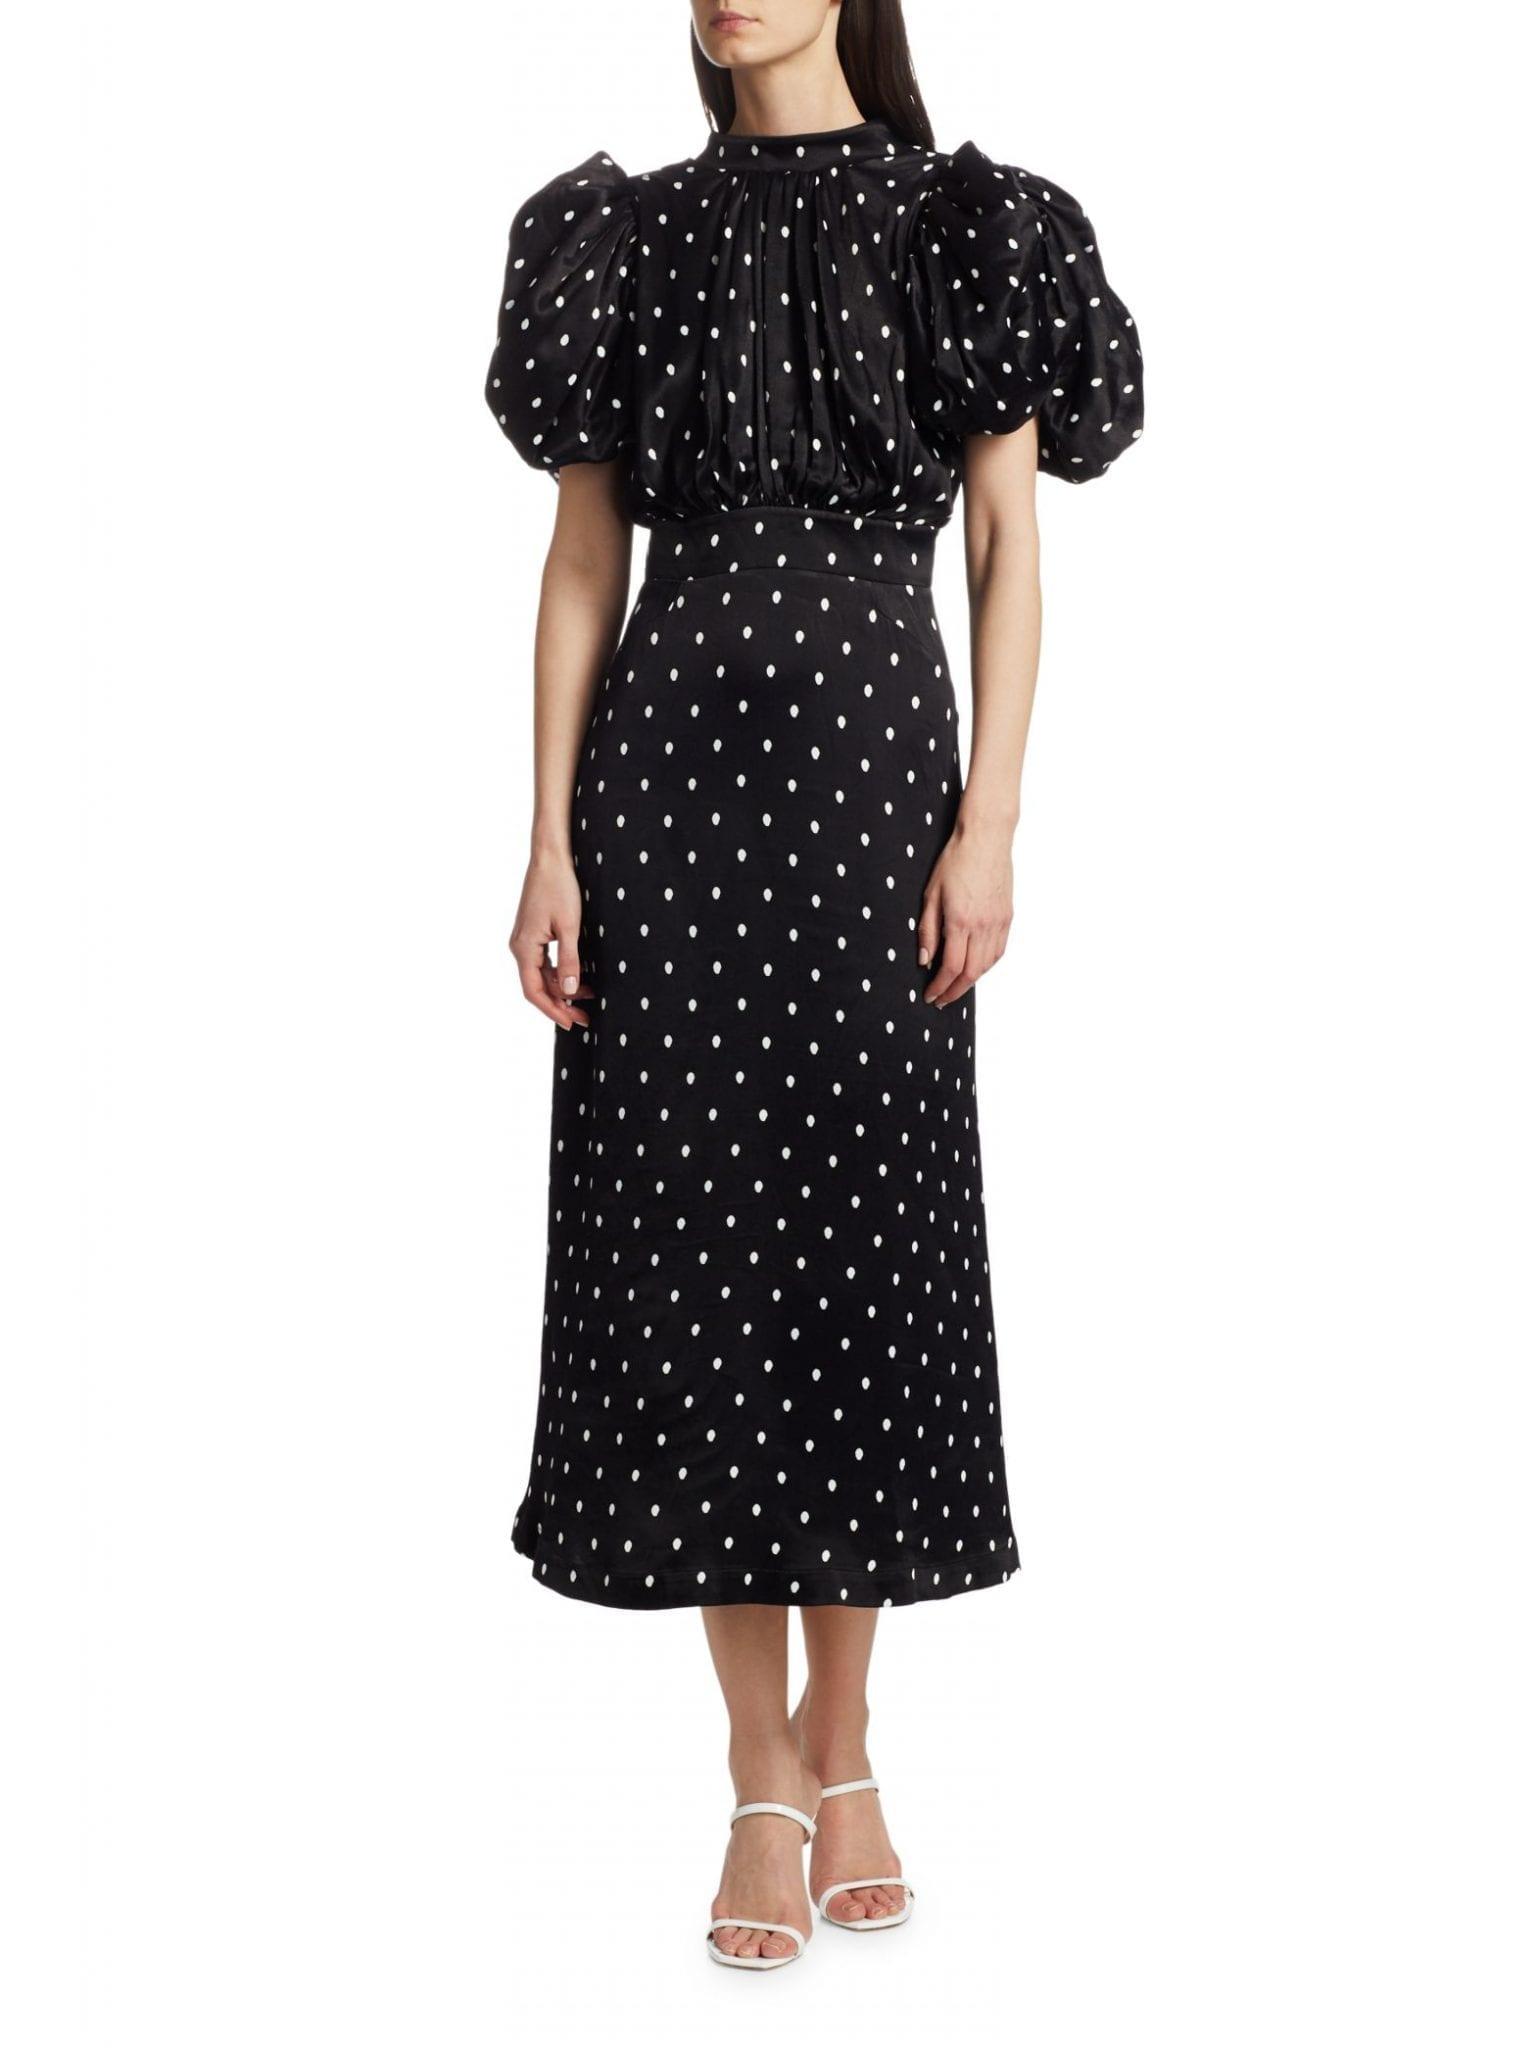 ROTATE BIRGER CHRISTENSEN Dawn High-Neck Polka Dot Midi Dress